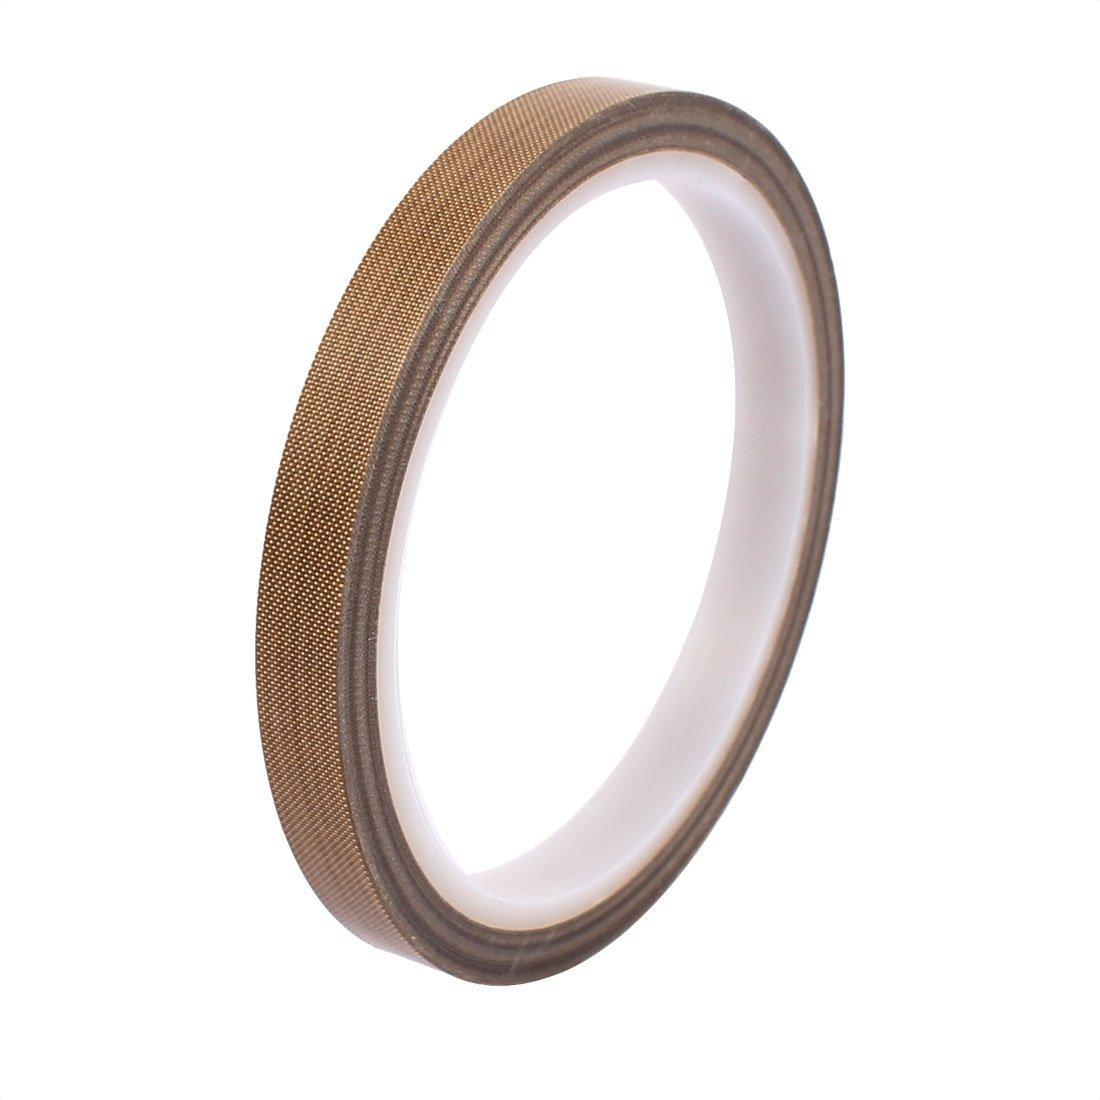 eDealMax 2 Pcs 0, 13 x Cinta de 10 mm de PTFE de alta temperatura cinta resistente cinta no adhesiva - - Amazon.com